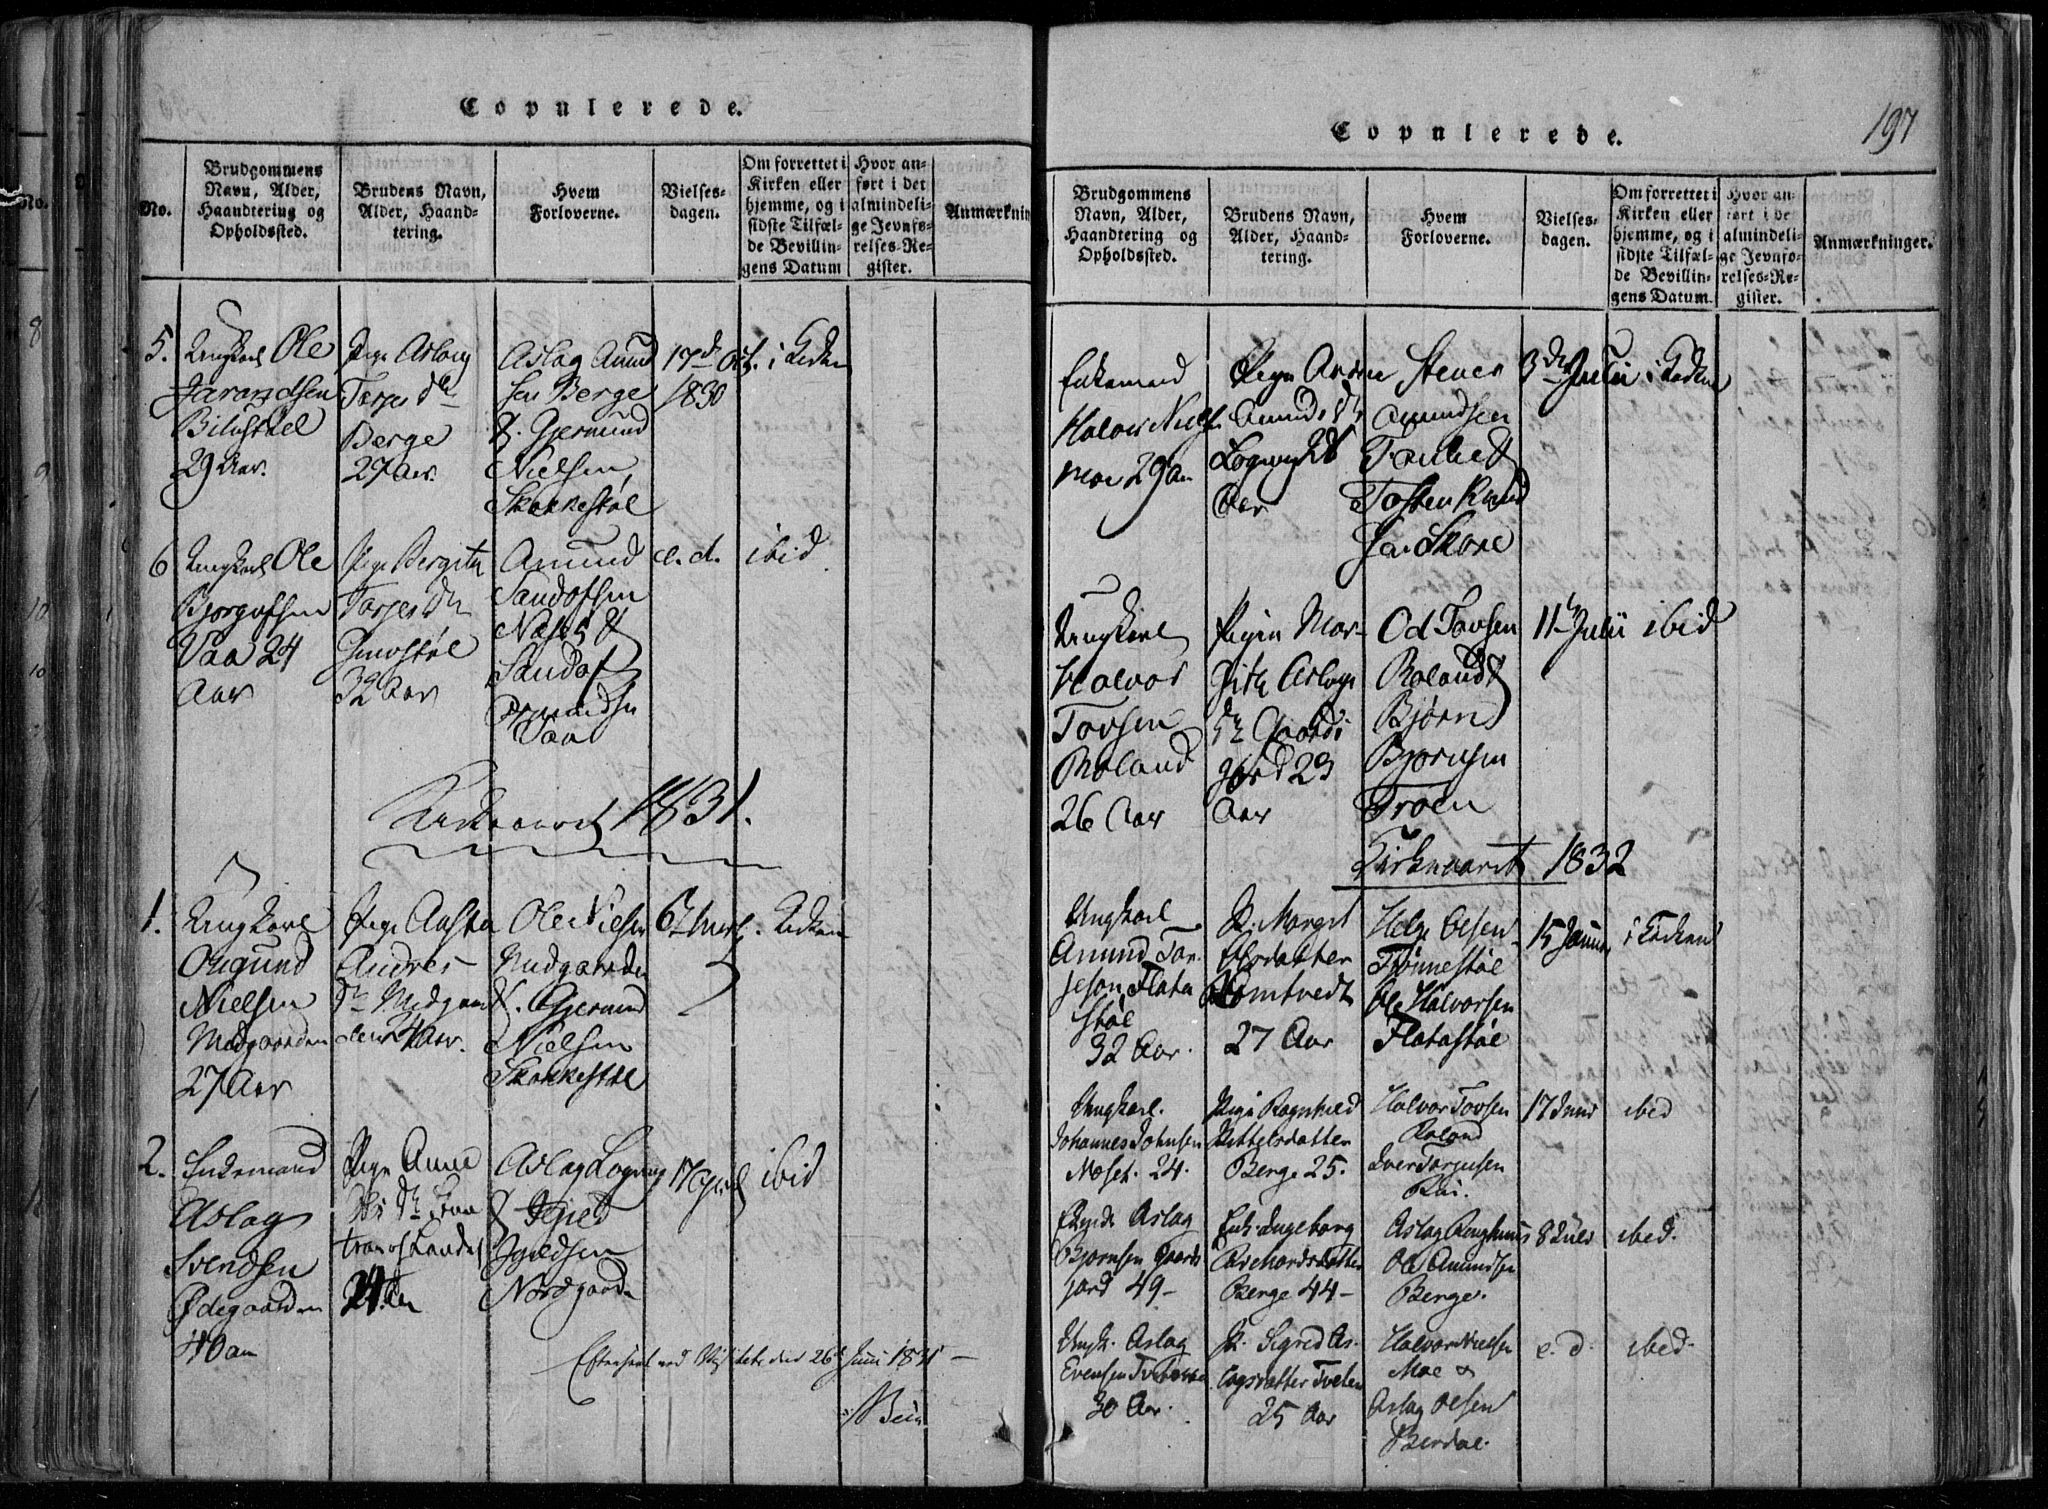 SAKO, Rauland kirkebøker, F/Fa/L0001: Ministerialbok nr. 1, 1814-1859, s. 197